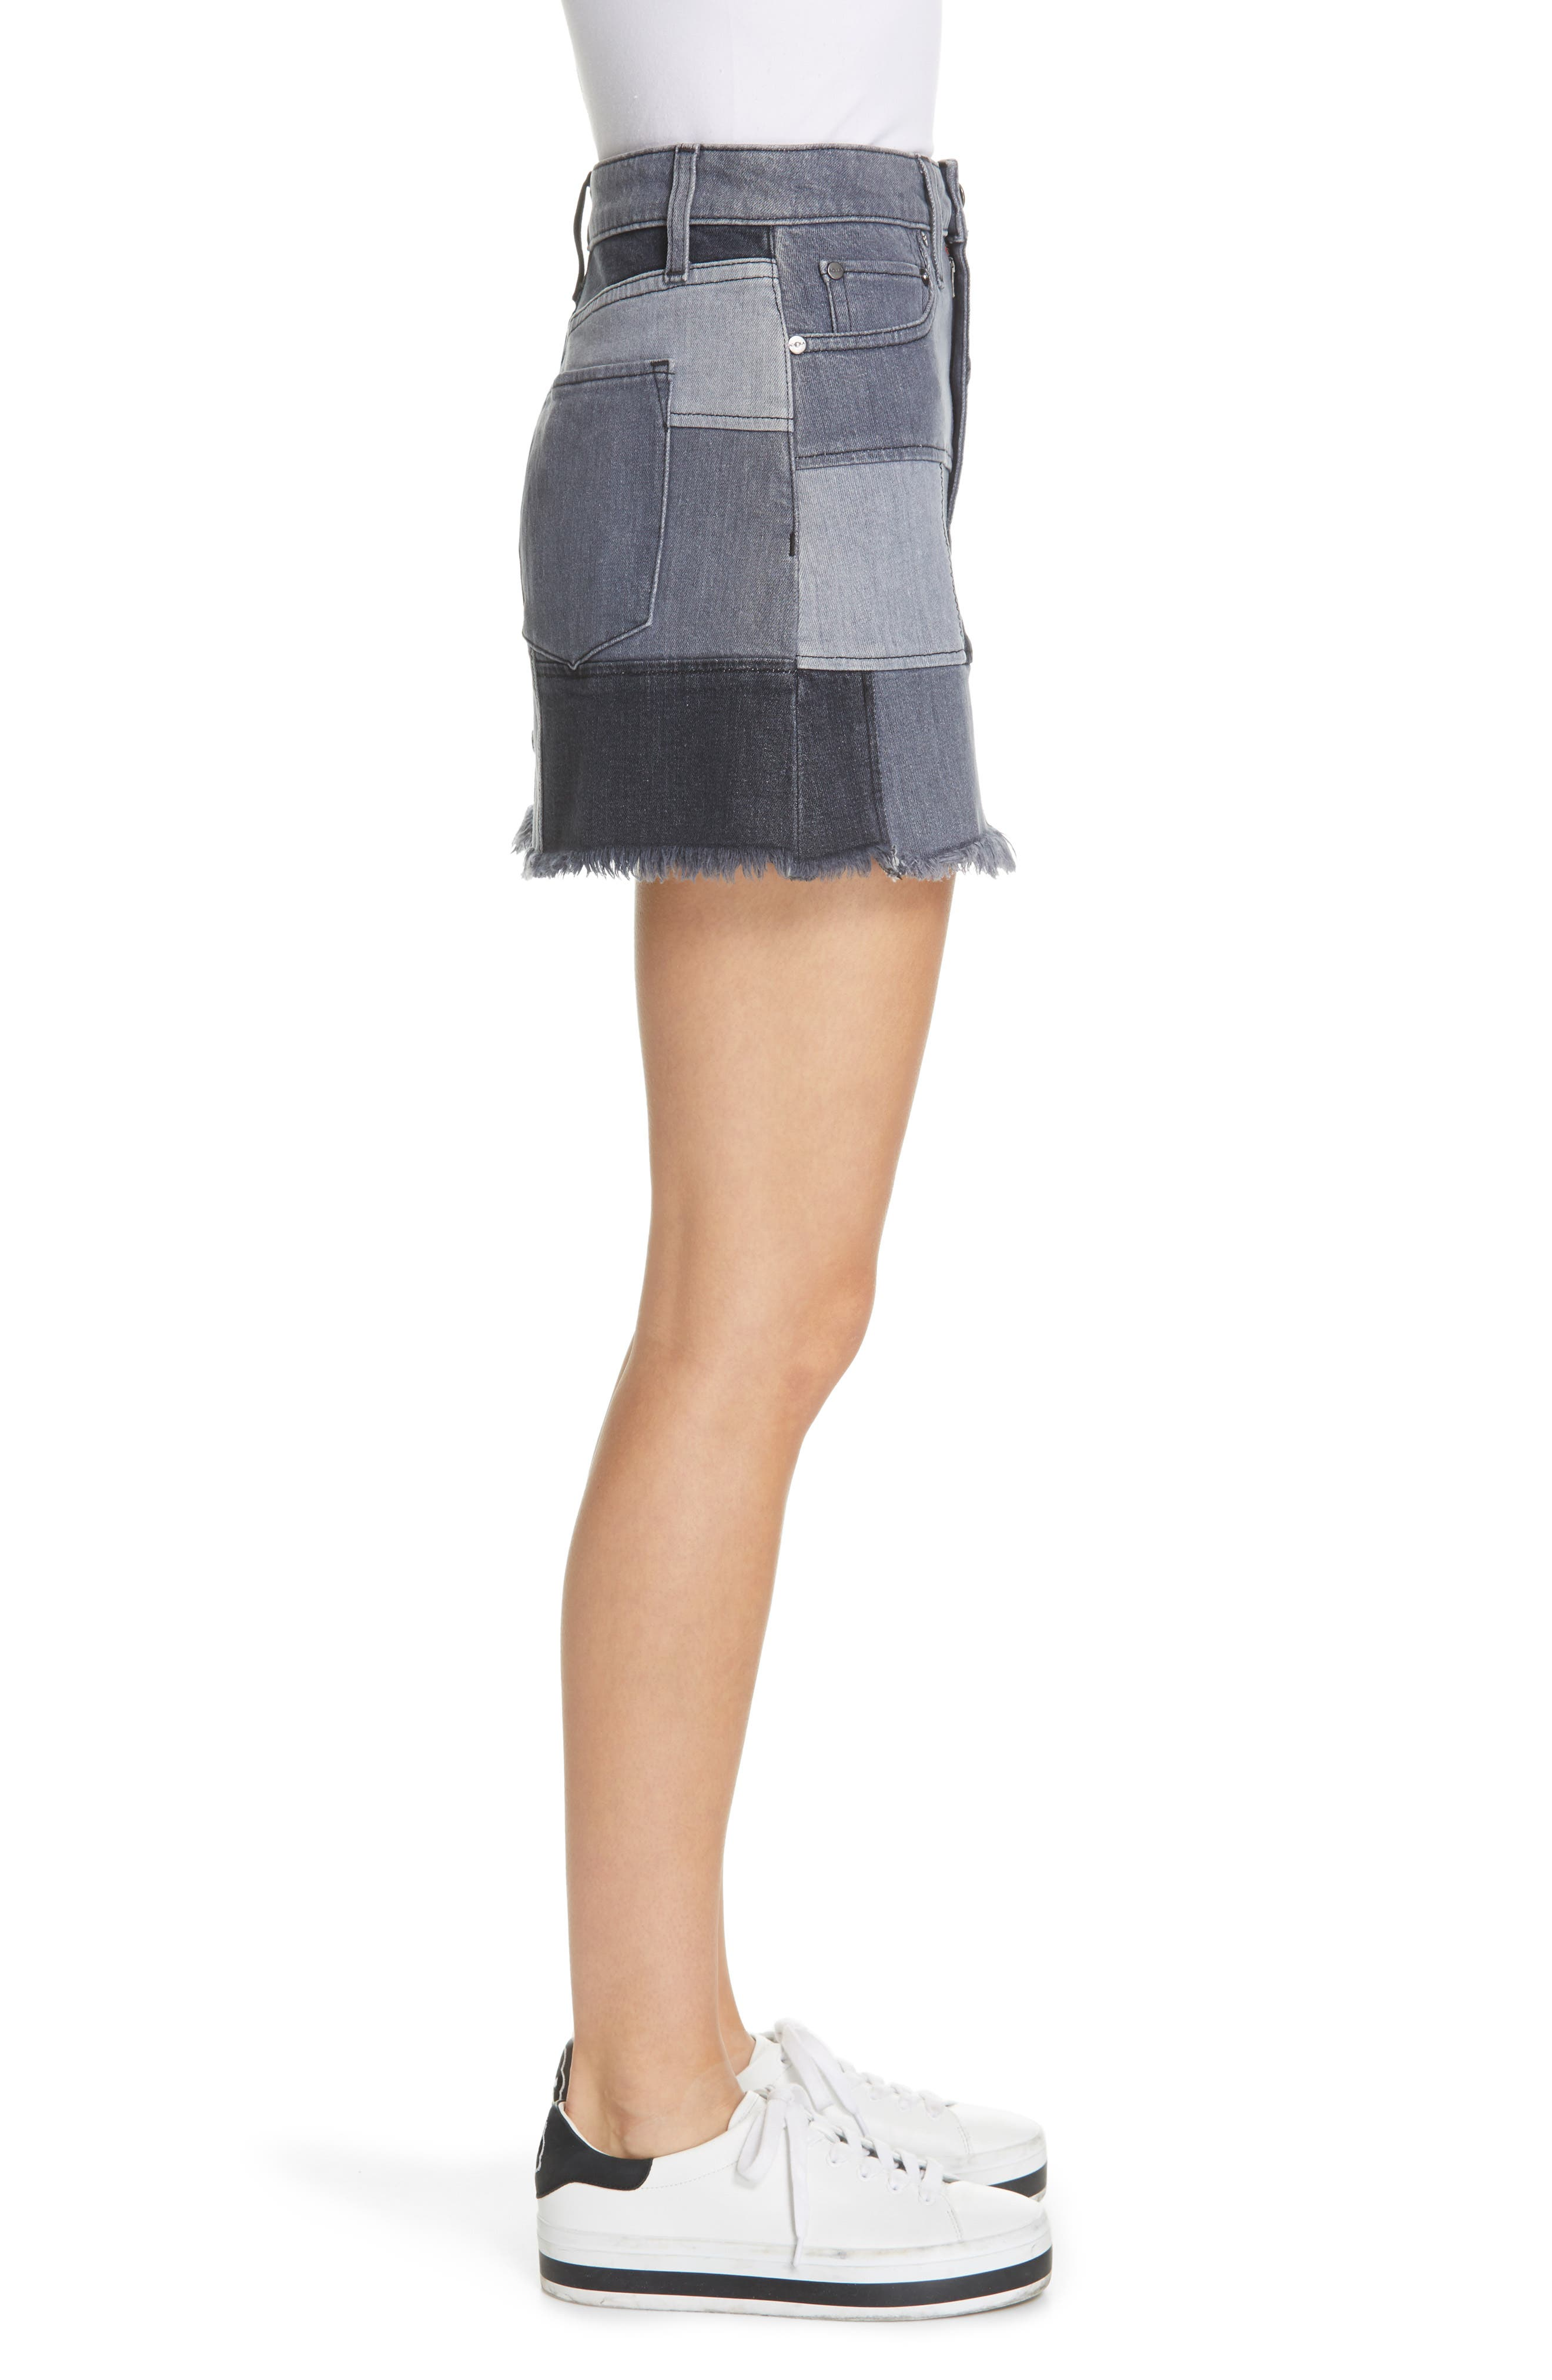 ALICE + OLIVIA JEANS,                             Amazing Patchwork Denim Miniskirt,                             Alternate thumbnail 3, color,                             NIGHT SKY